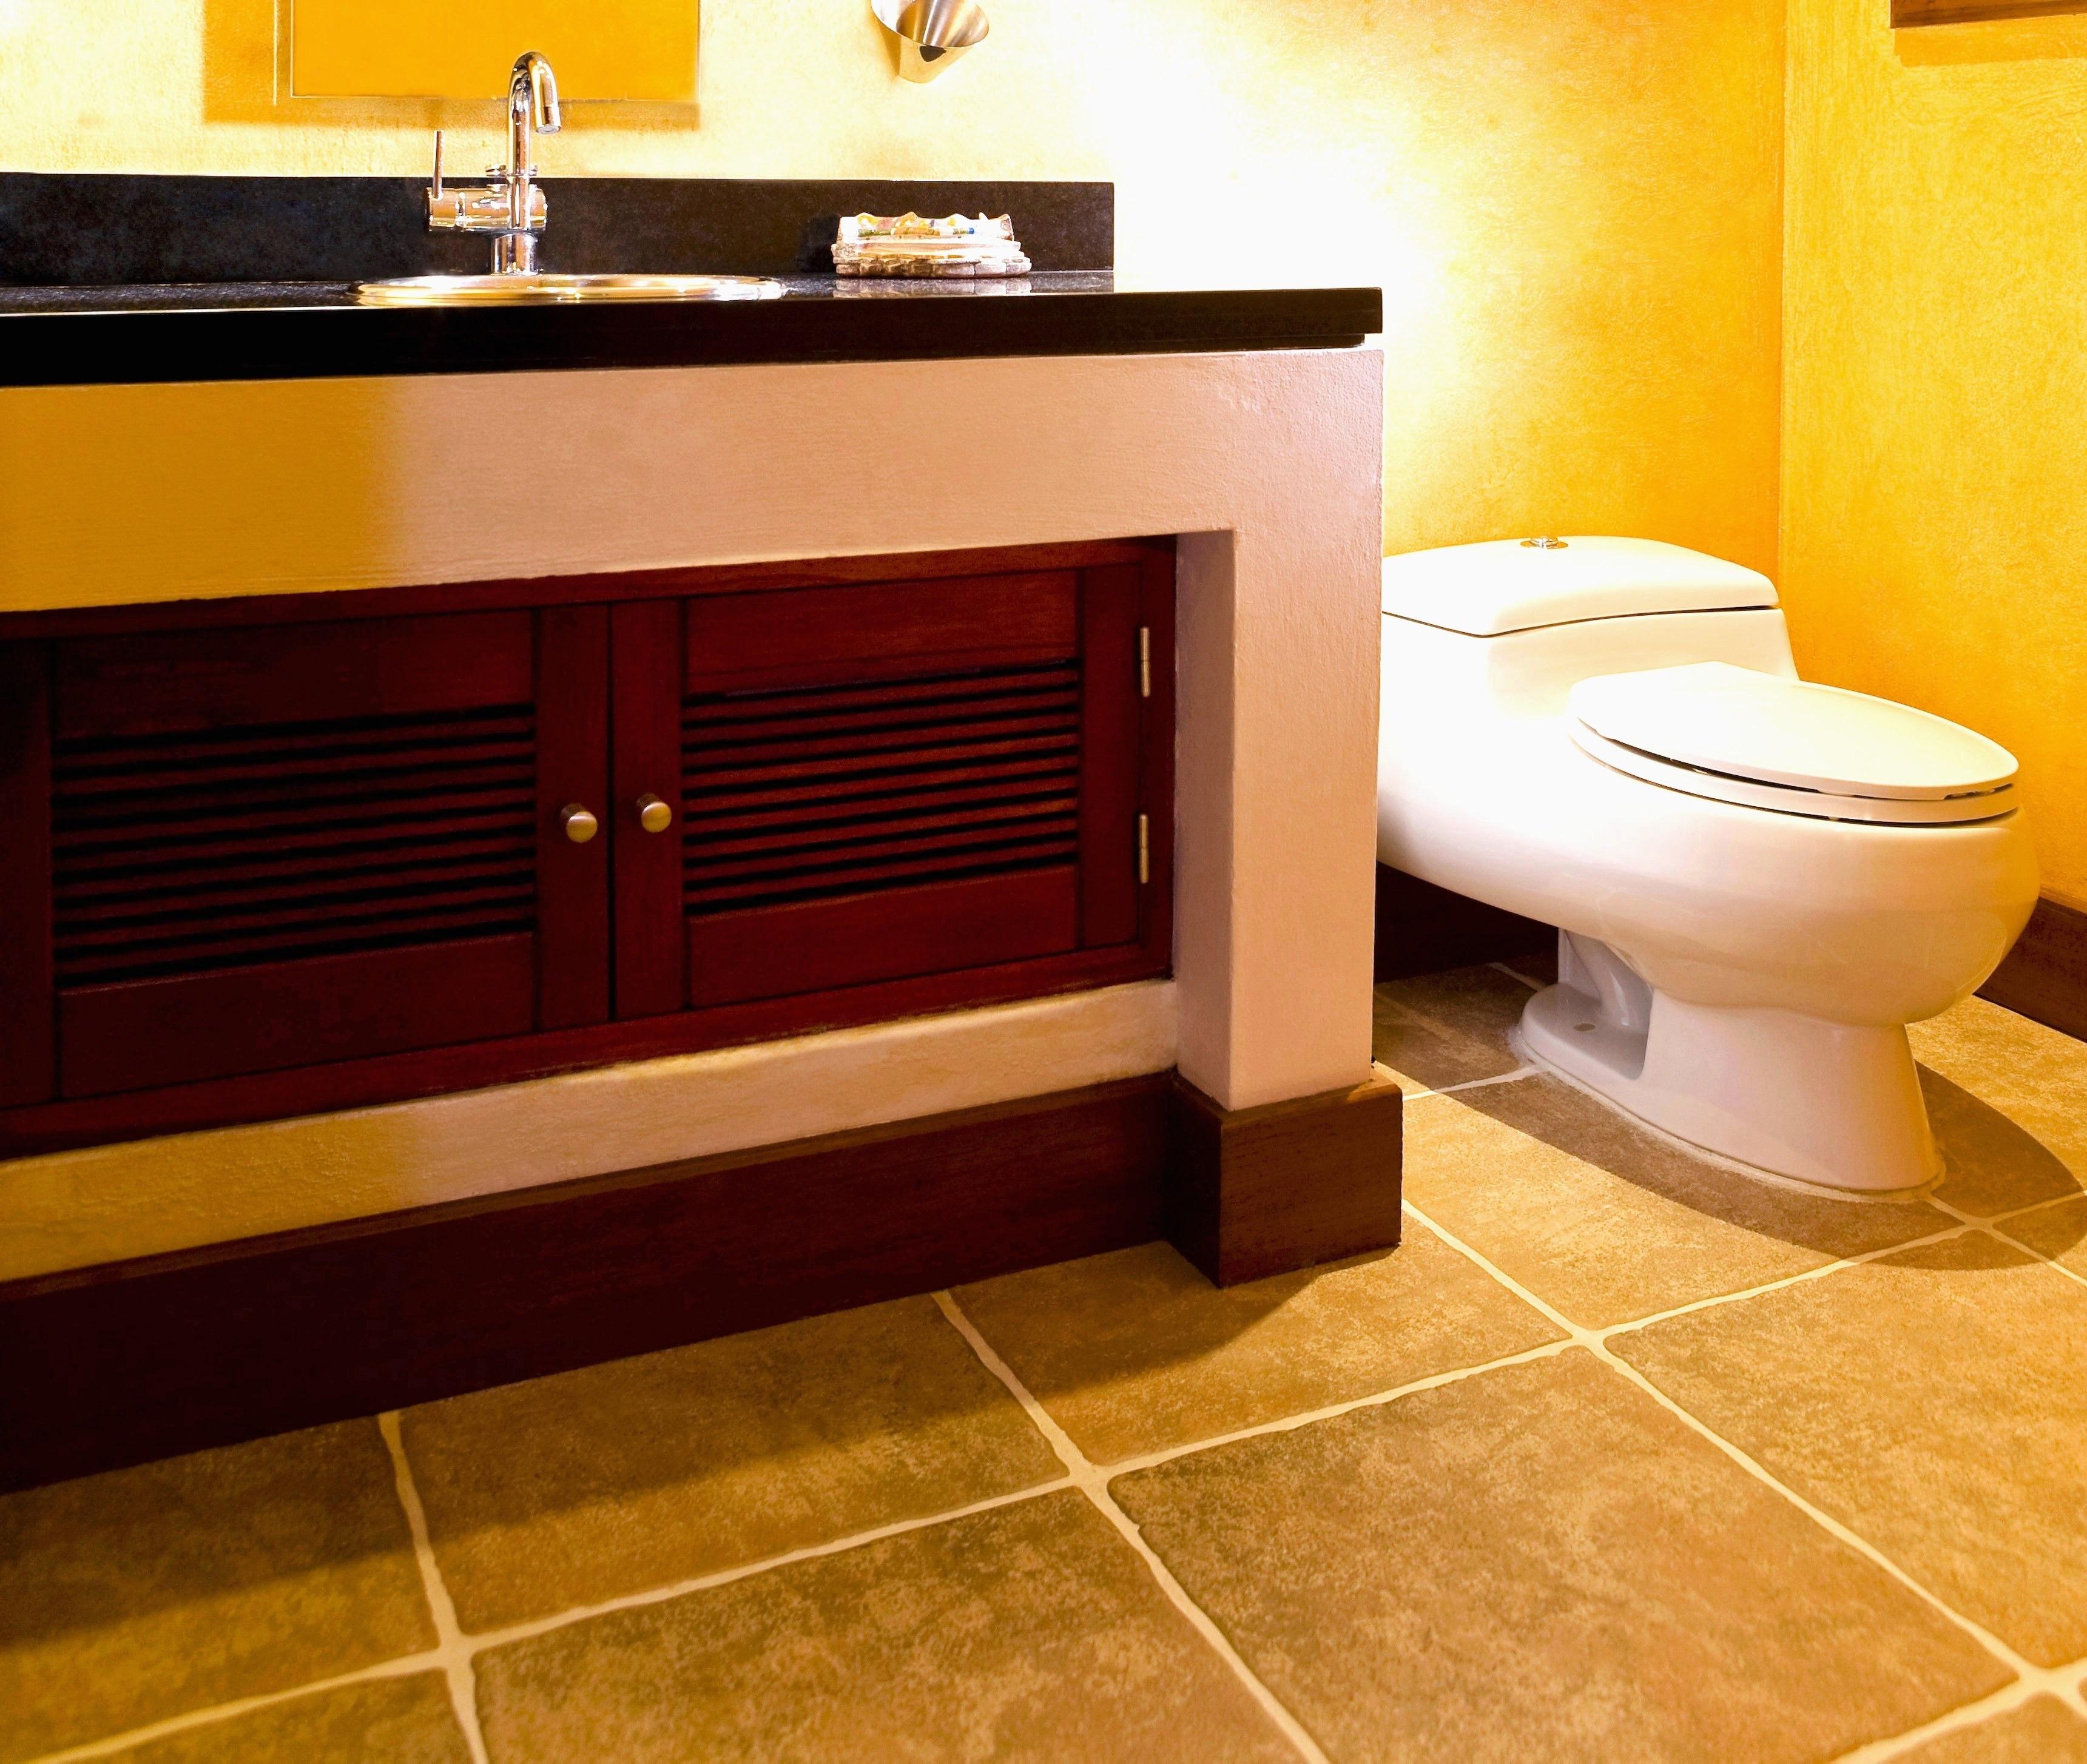 hardwood floor varnish of enchanting clear varnish for wood furniture on premier hardwood within catchy tiles for bathrooms at home decor tile best floor tiles mosaic bathroom 0d new bathroom